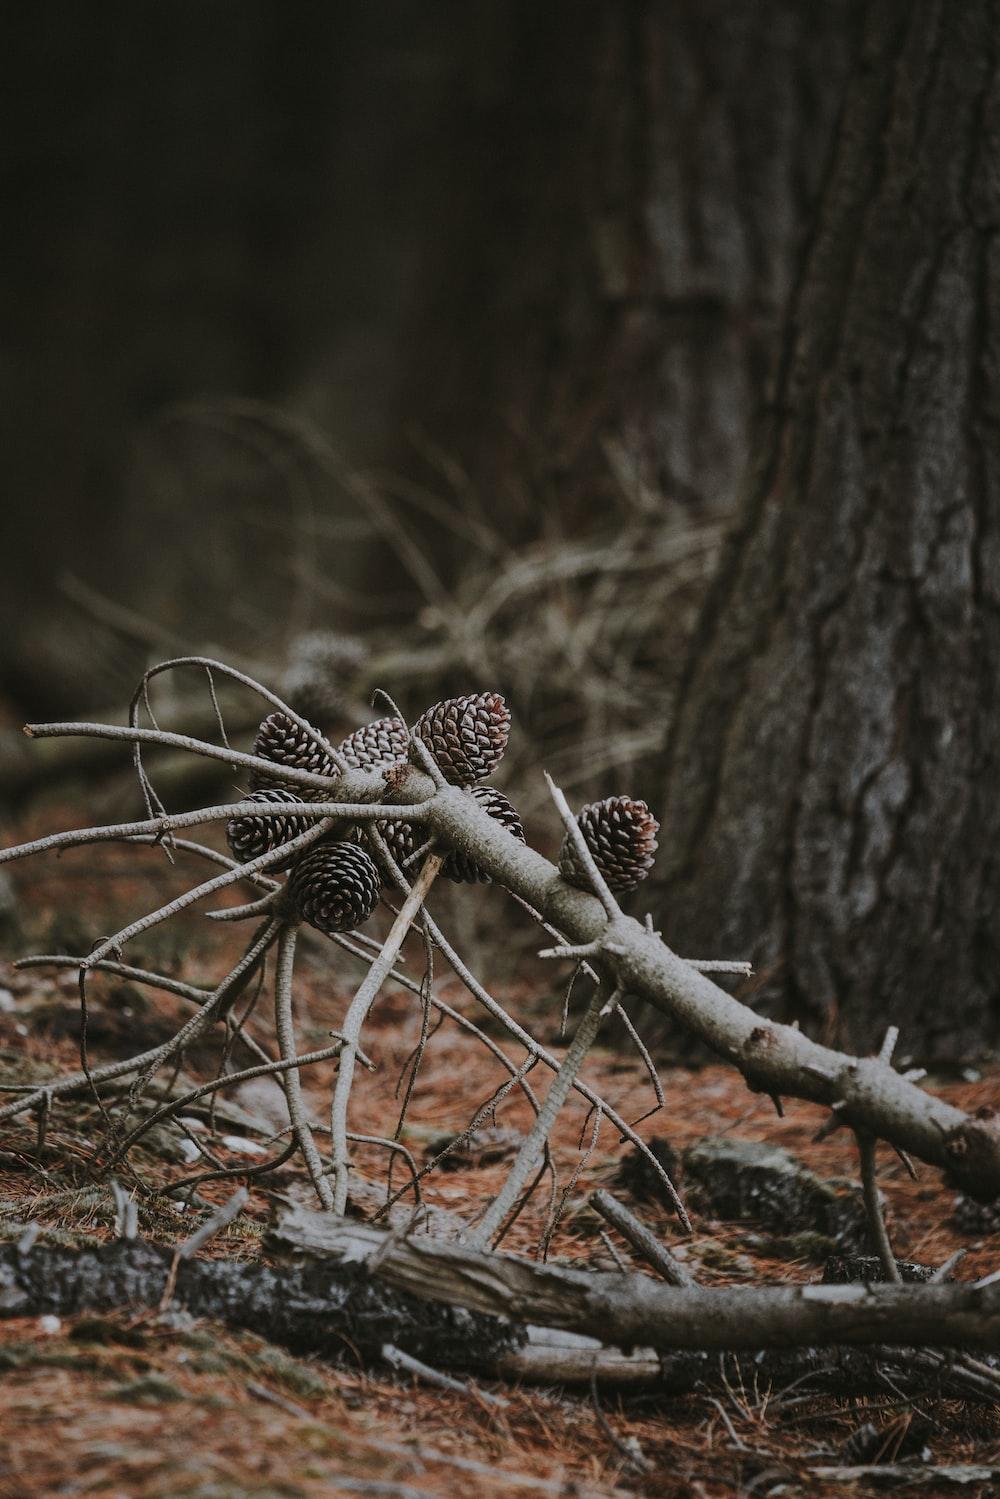 pine cones on dry leaves